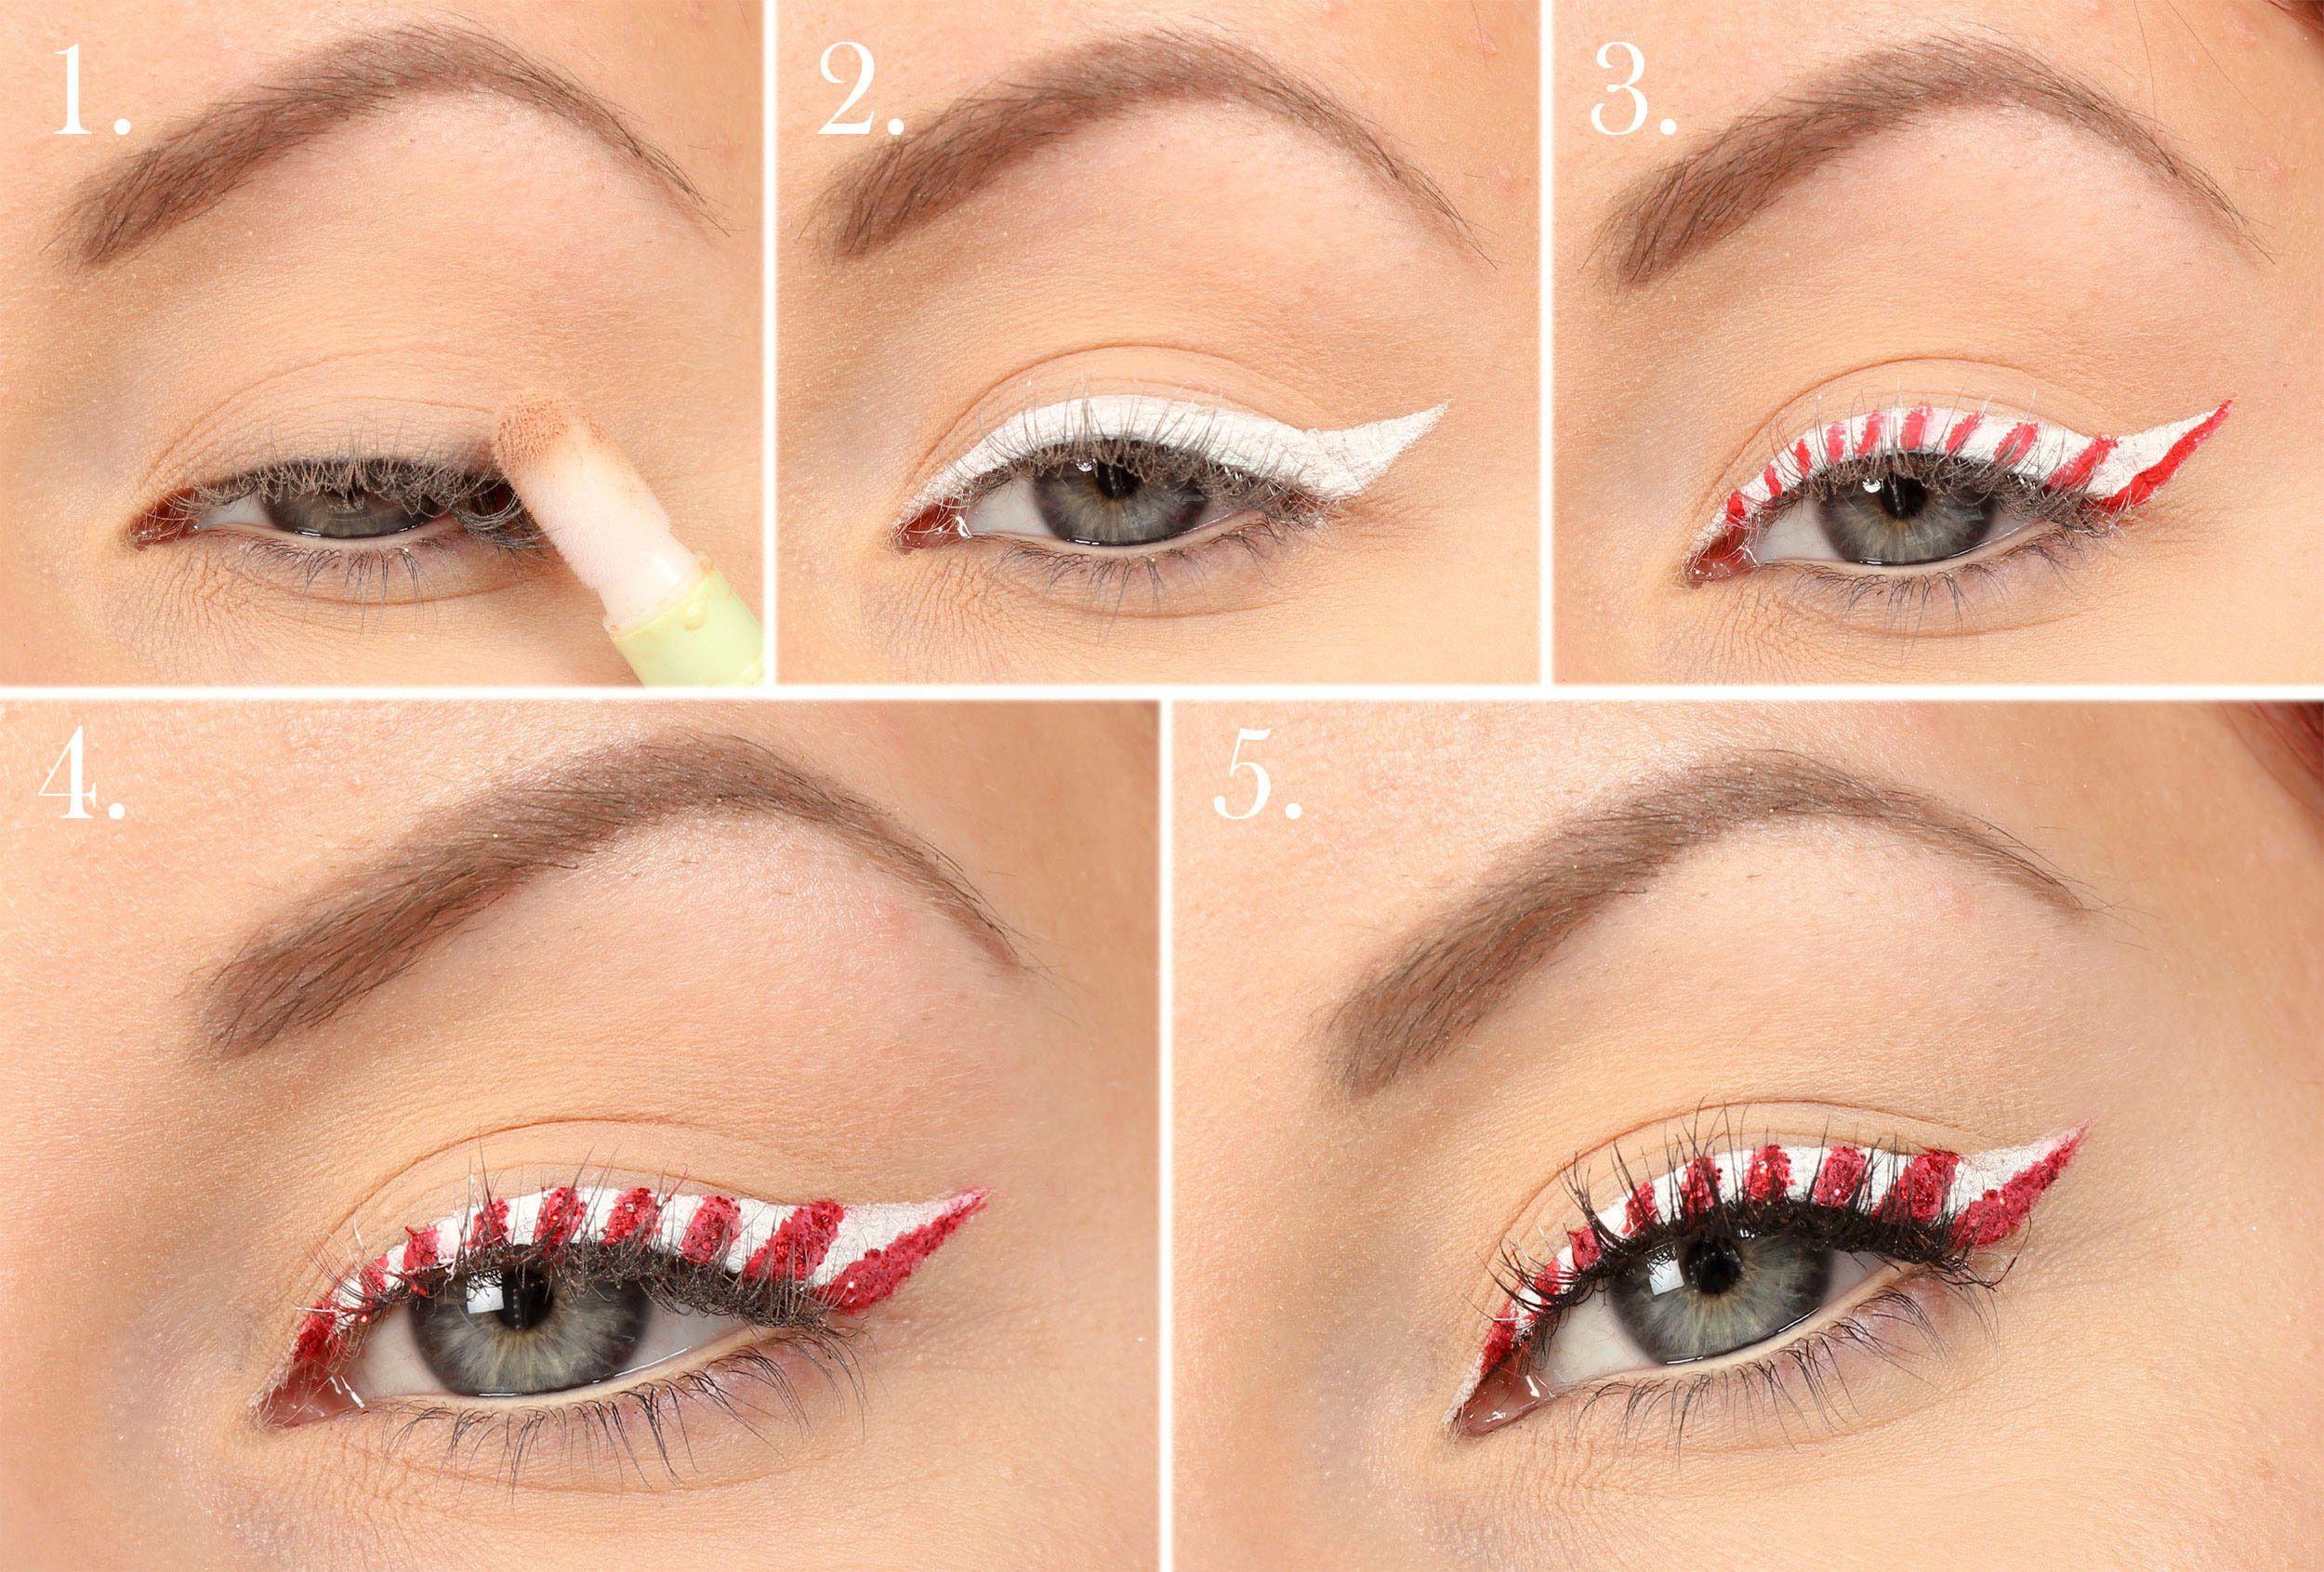 Candy cane eyeliner in 2020 Candy cane eyeliner